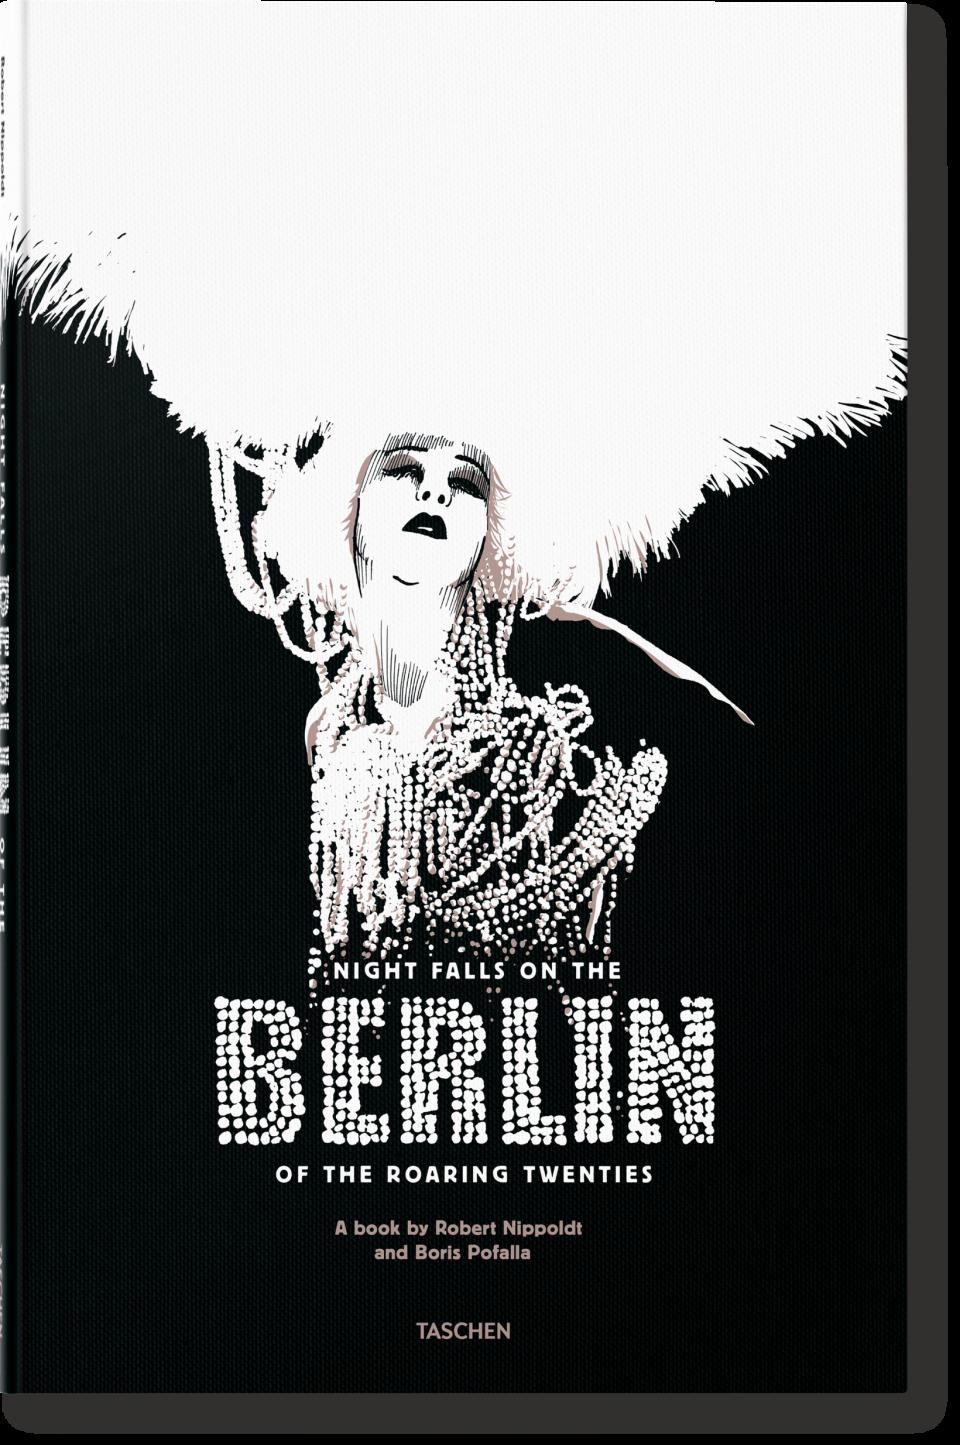 Night Falls on the Berlin of the Roaring Twenties - Nippoldt Robert